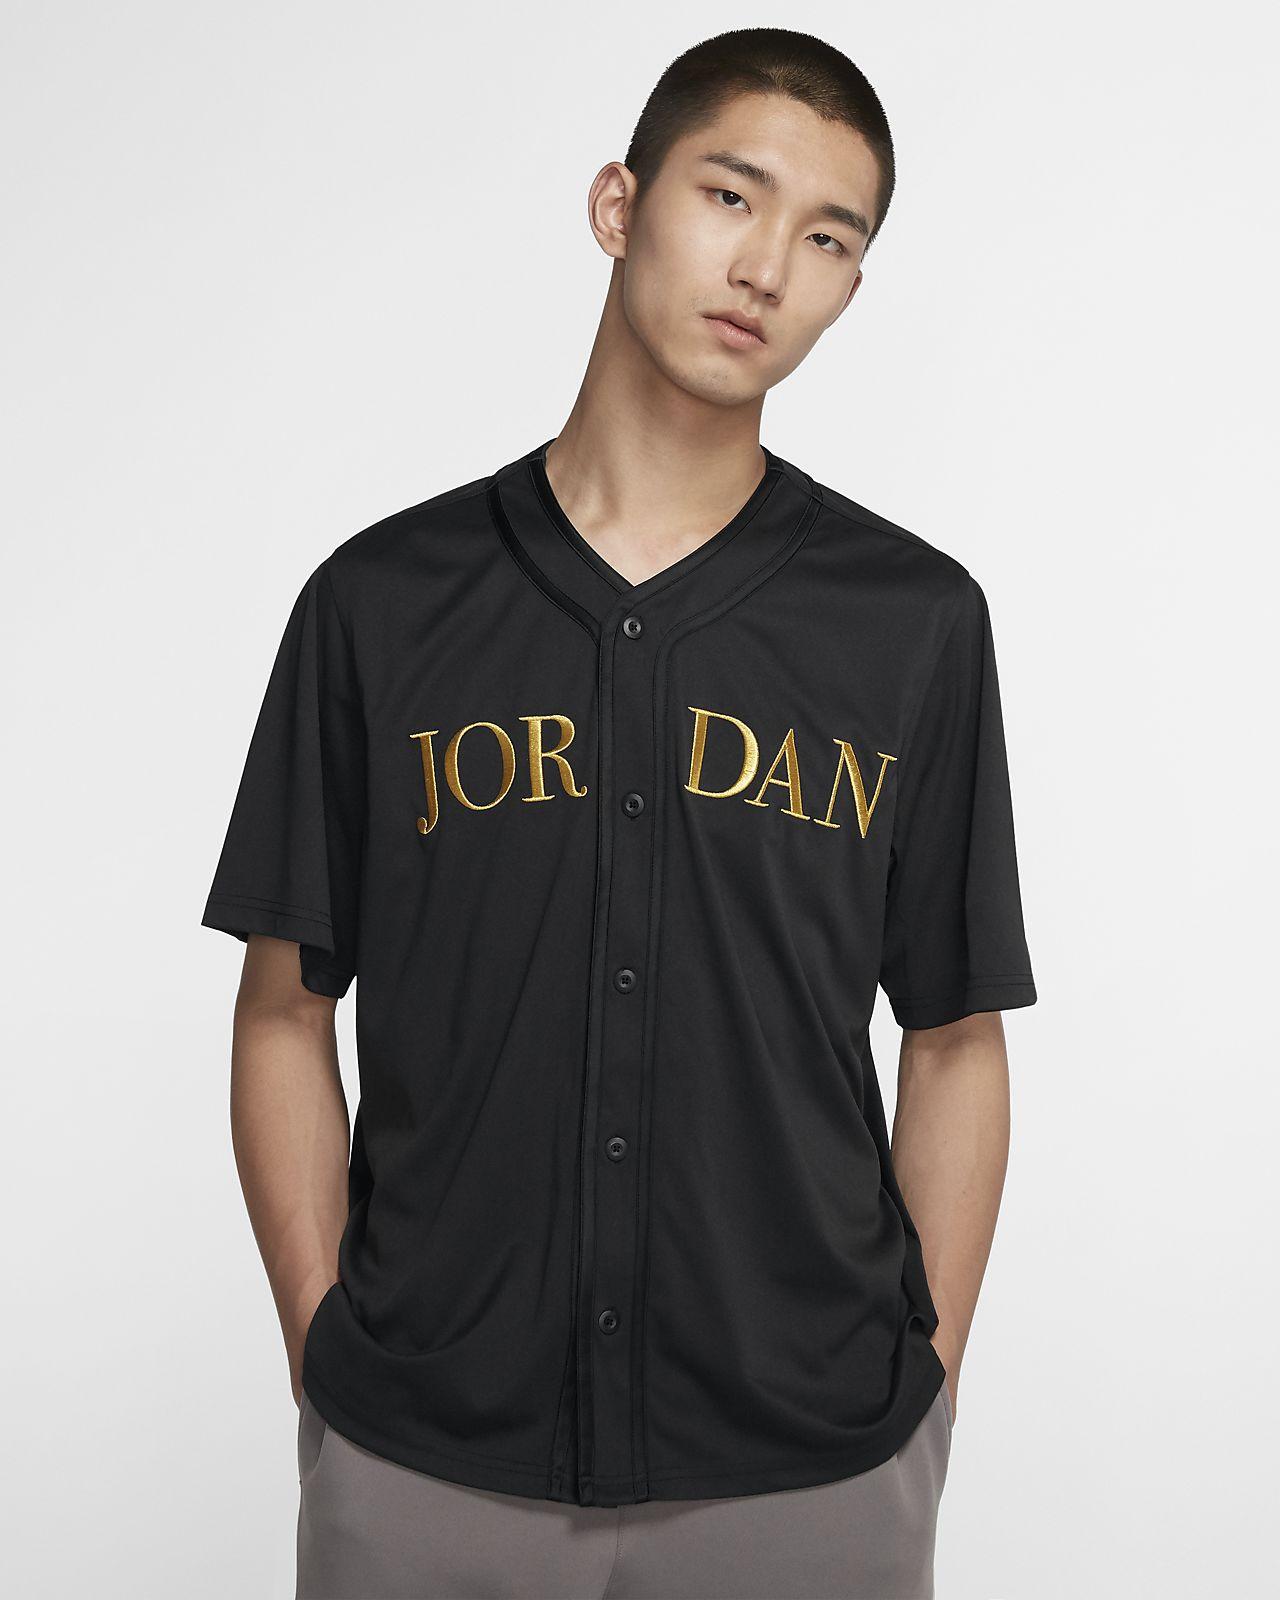 Jordan Remastered 男子棒球上衣